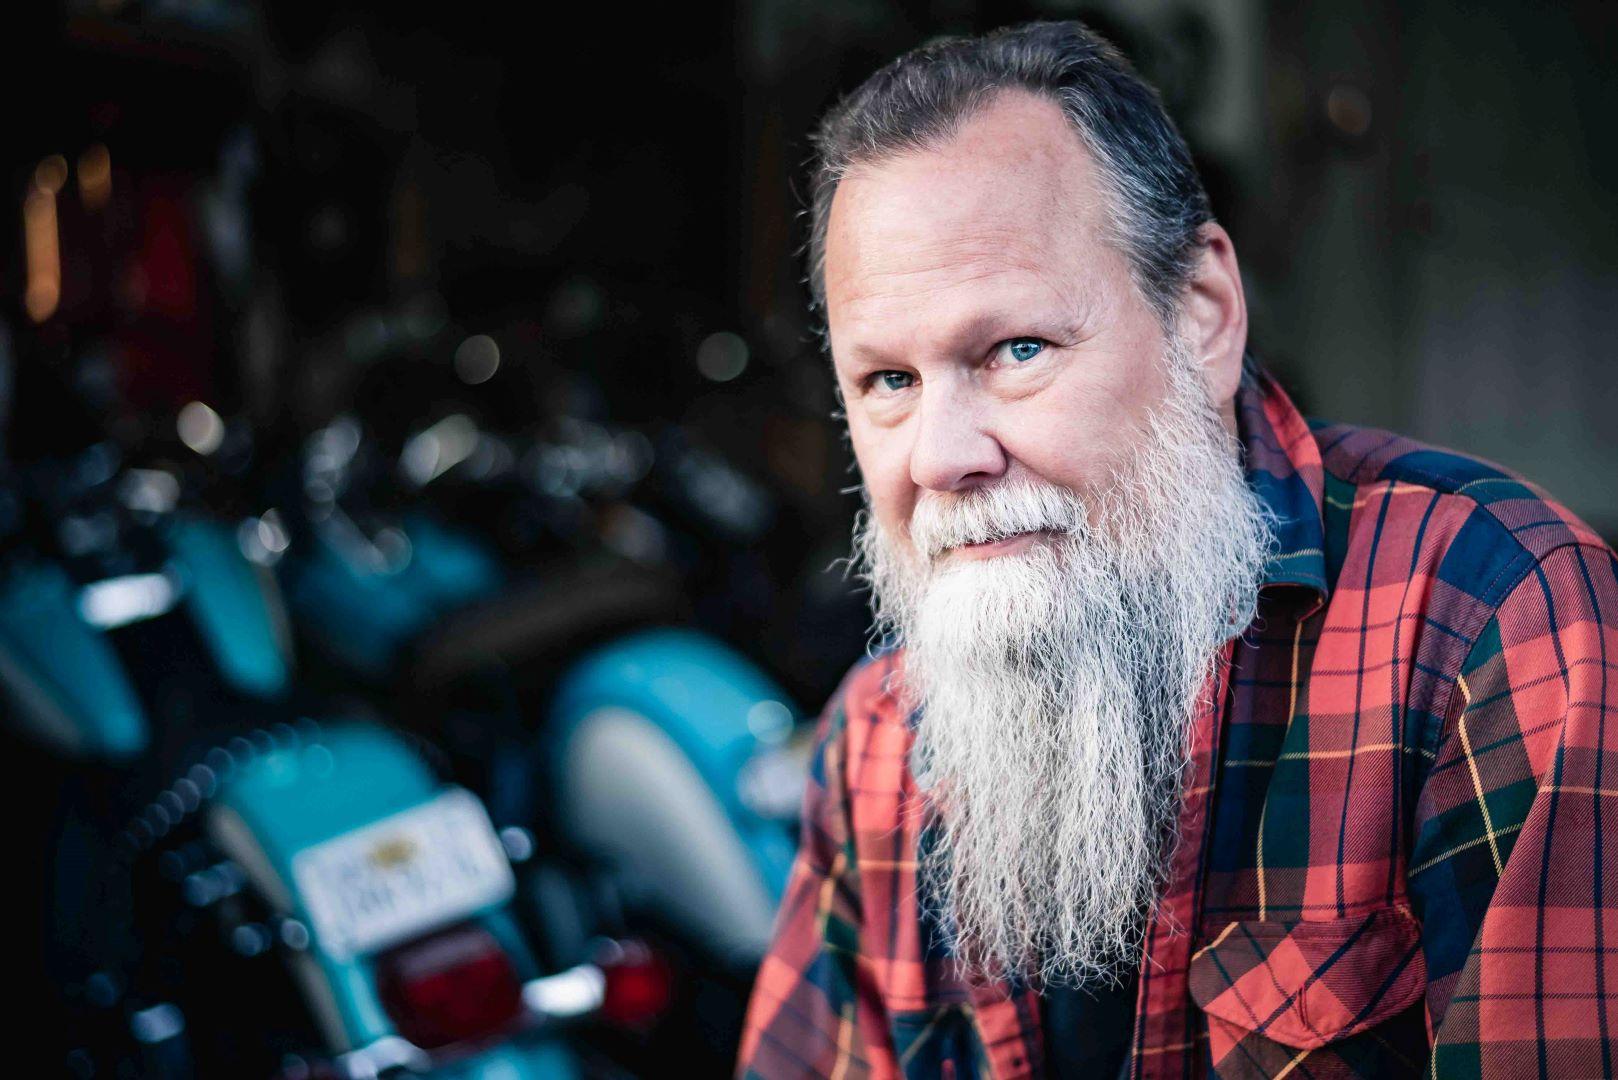 neilson corporate portrait photography beard motorcycle candid